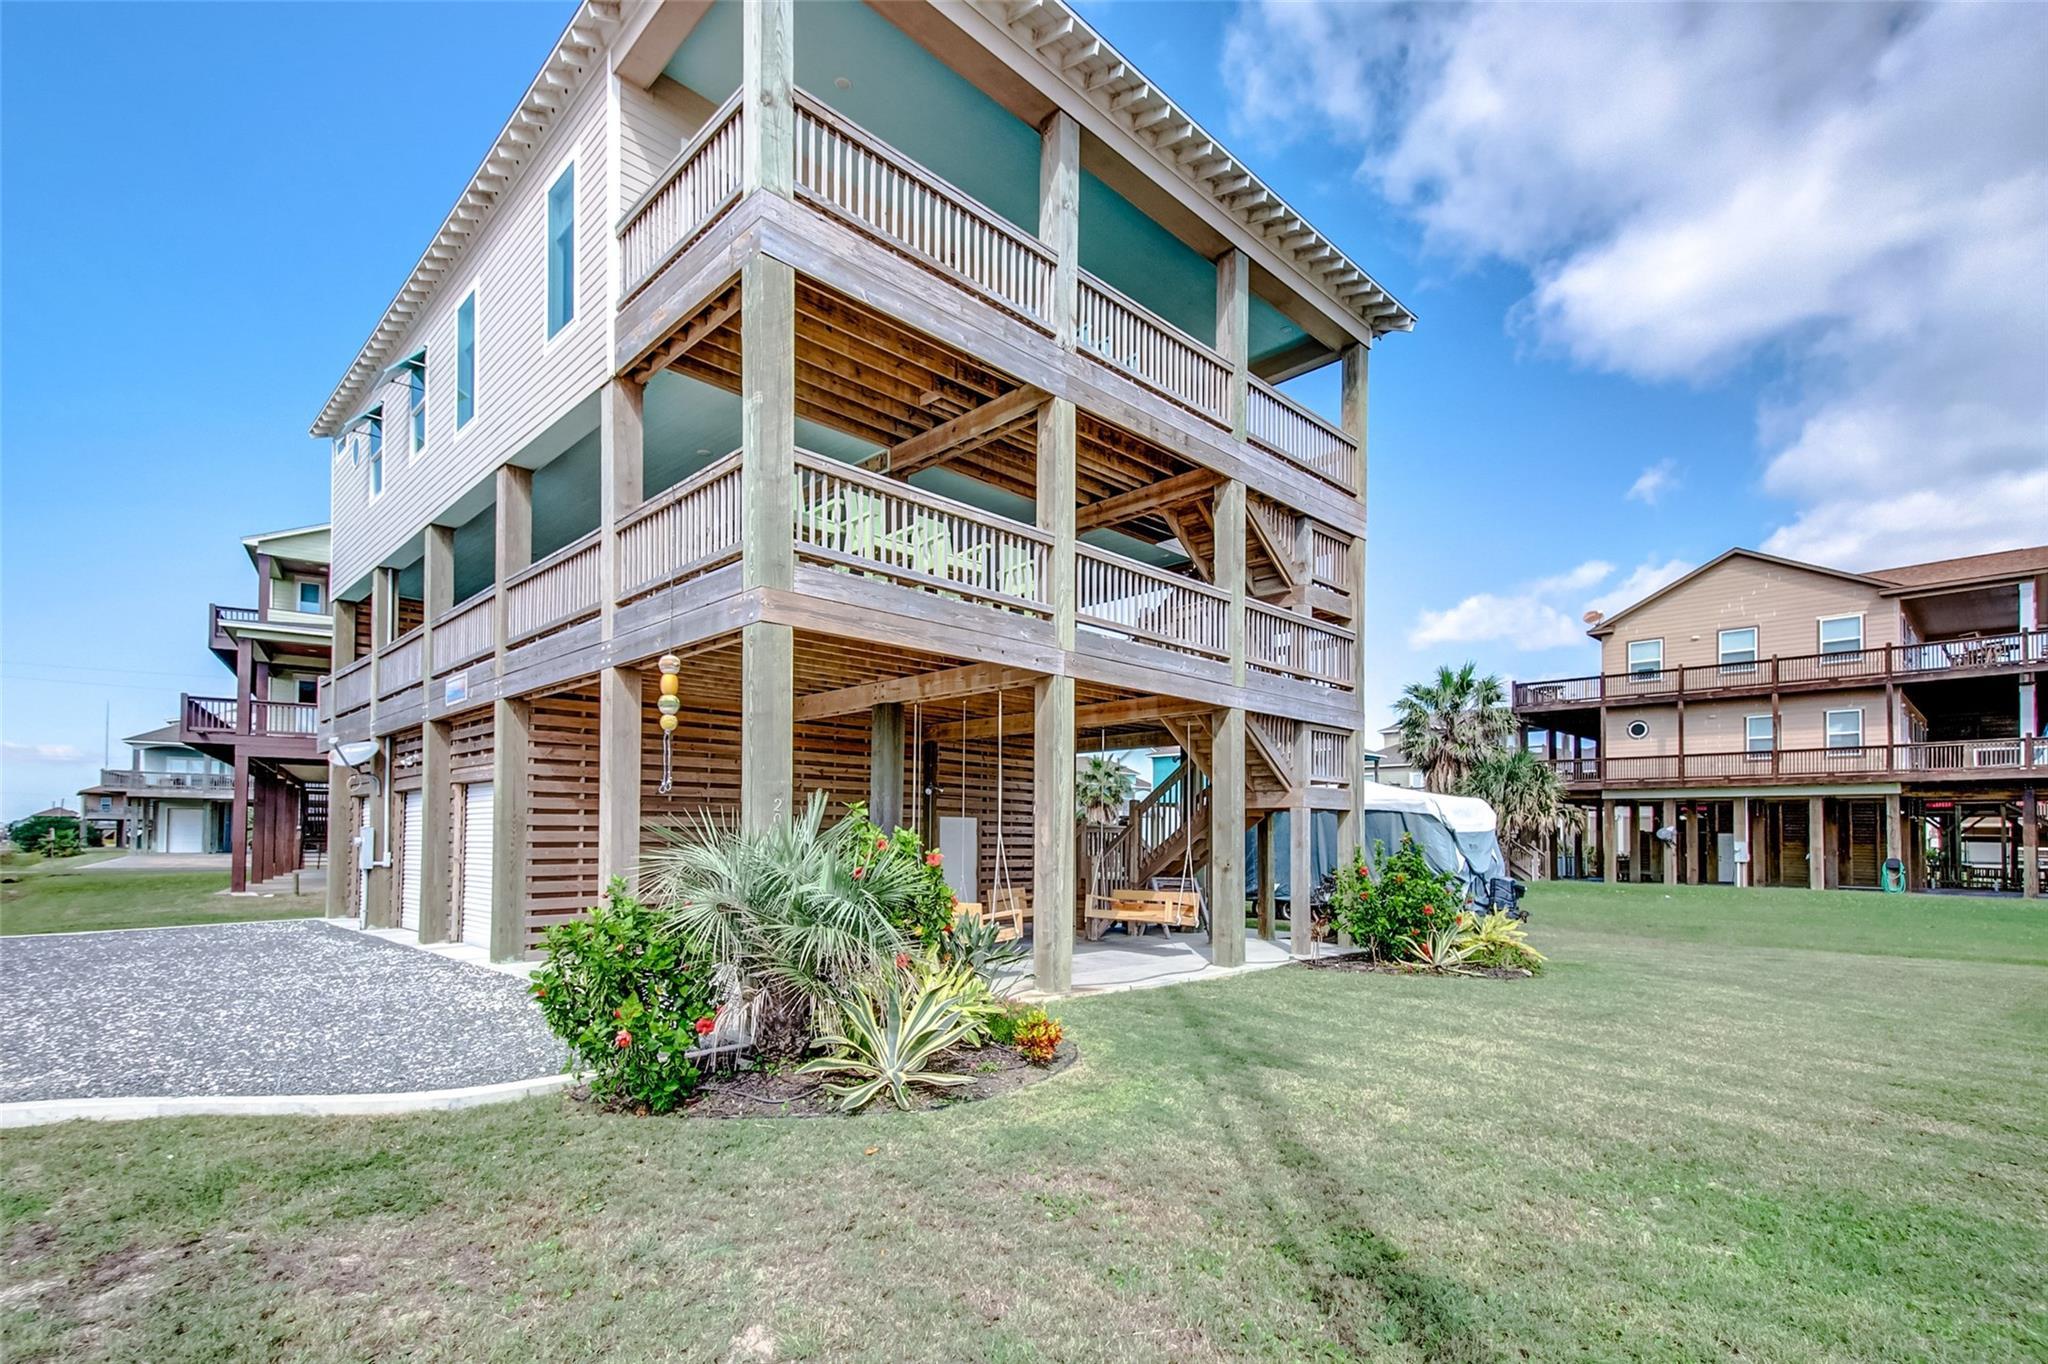 2019 Seaside Property Photo